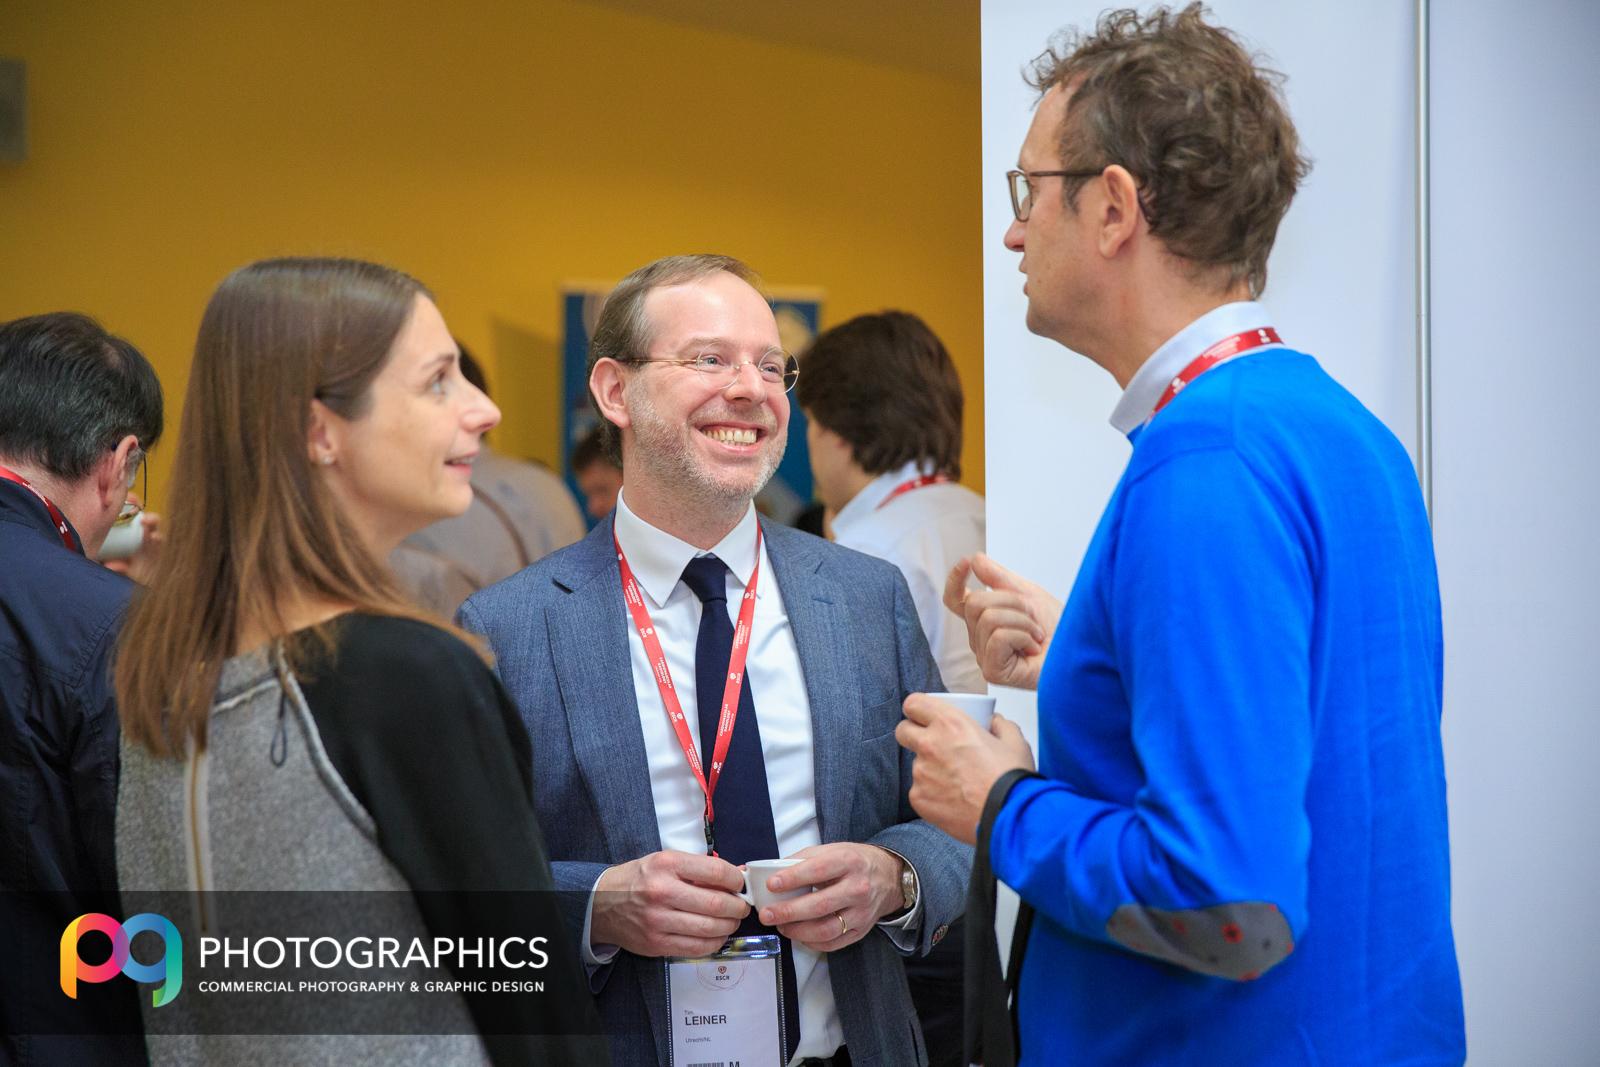 ESCR-2018-conference-event-photography-UK-glasgow-edinburgh-6.jpg